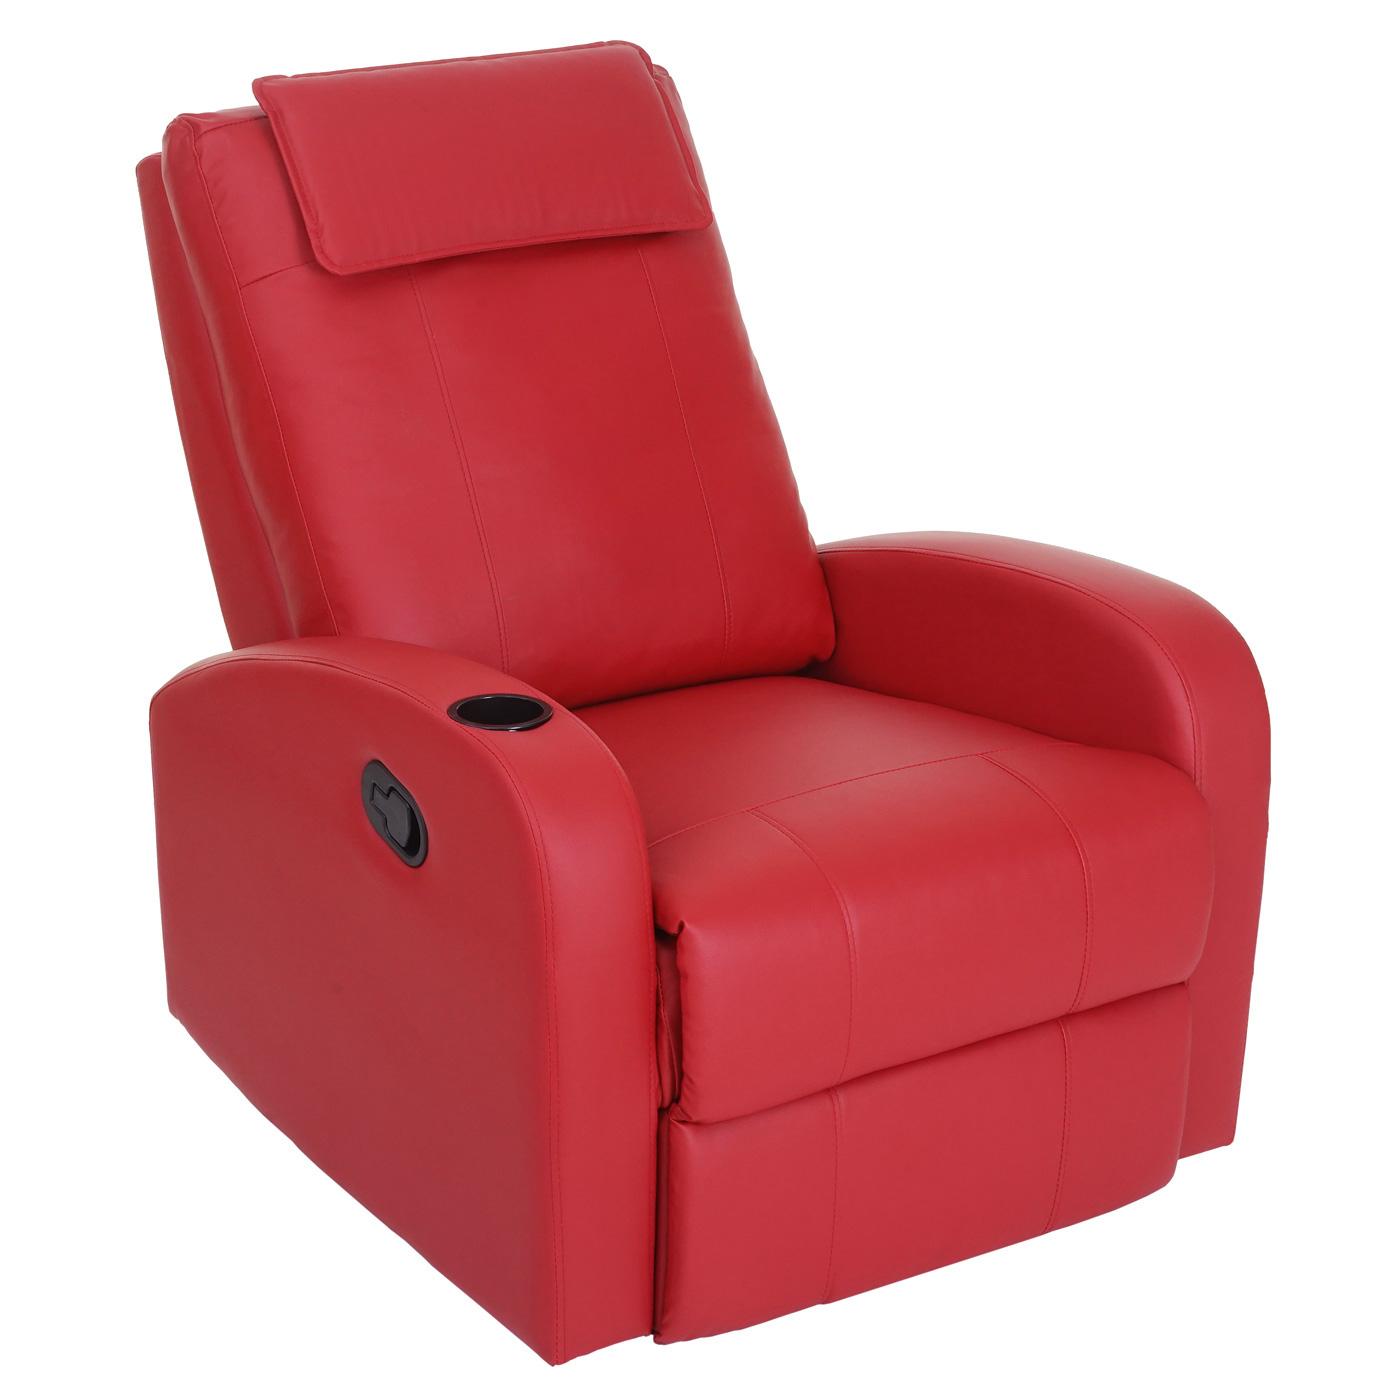 fernsehsessel durham tv sessel relaxsessel liegesessel. Black Bedroom Furniture Sets. Home Design Ideas